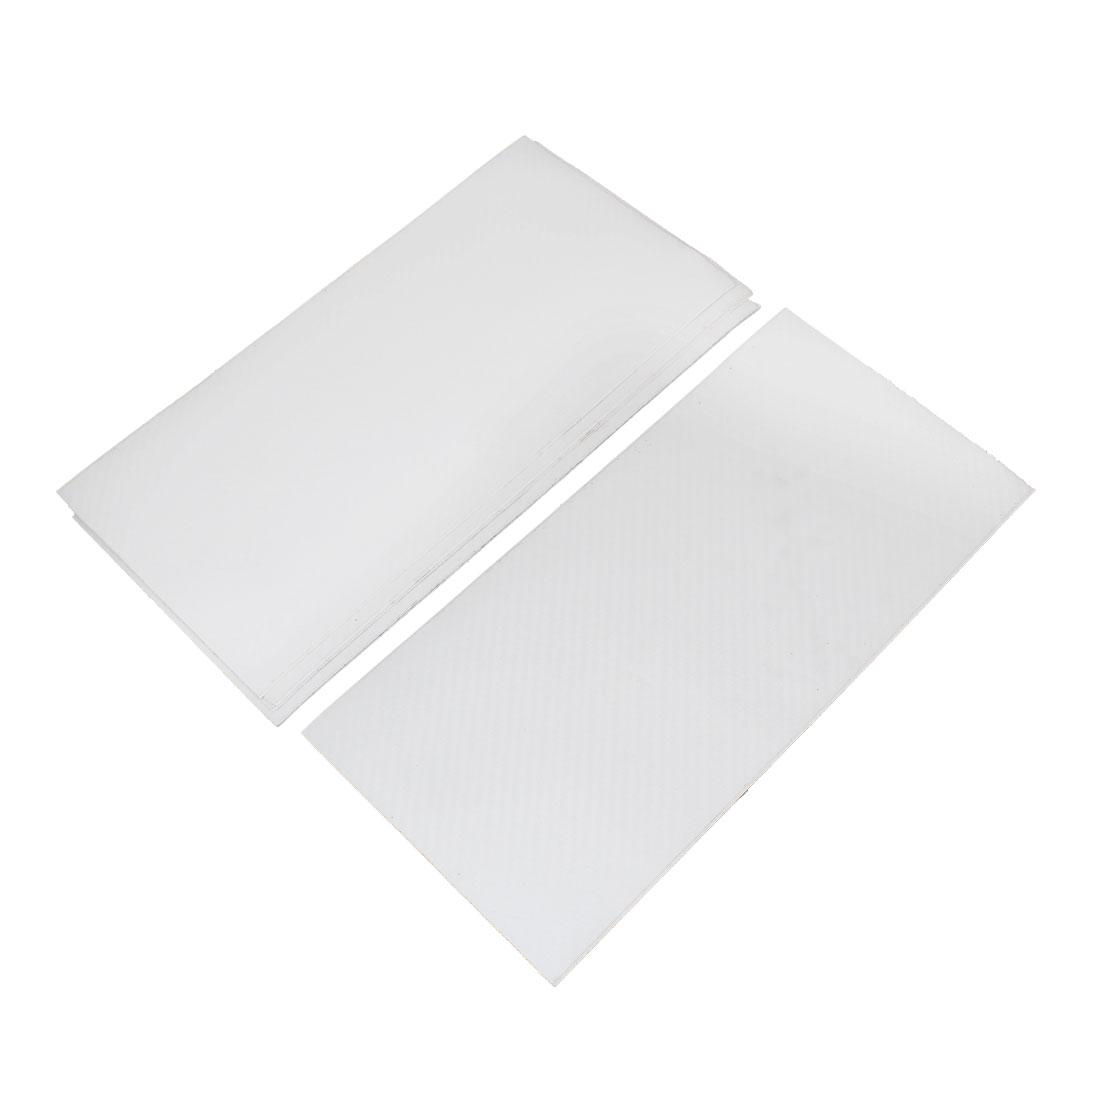 10 Pcs 300 x 143mm Self Adhesive Carbon Fiber Film Sticker White for Vehicle - image 3 de 3